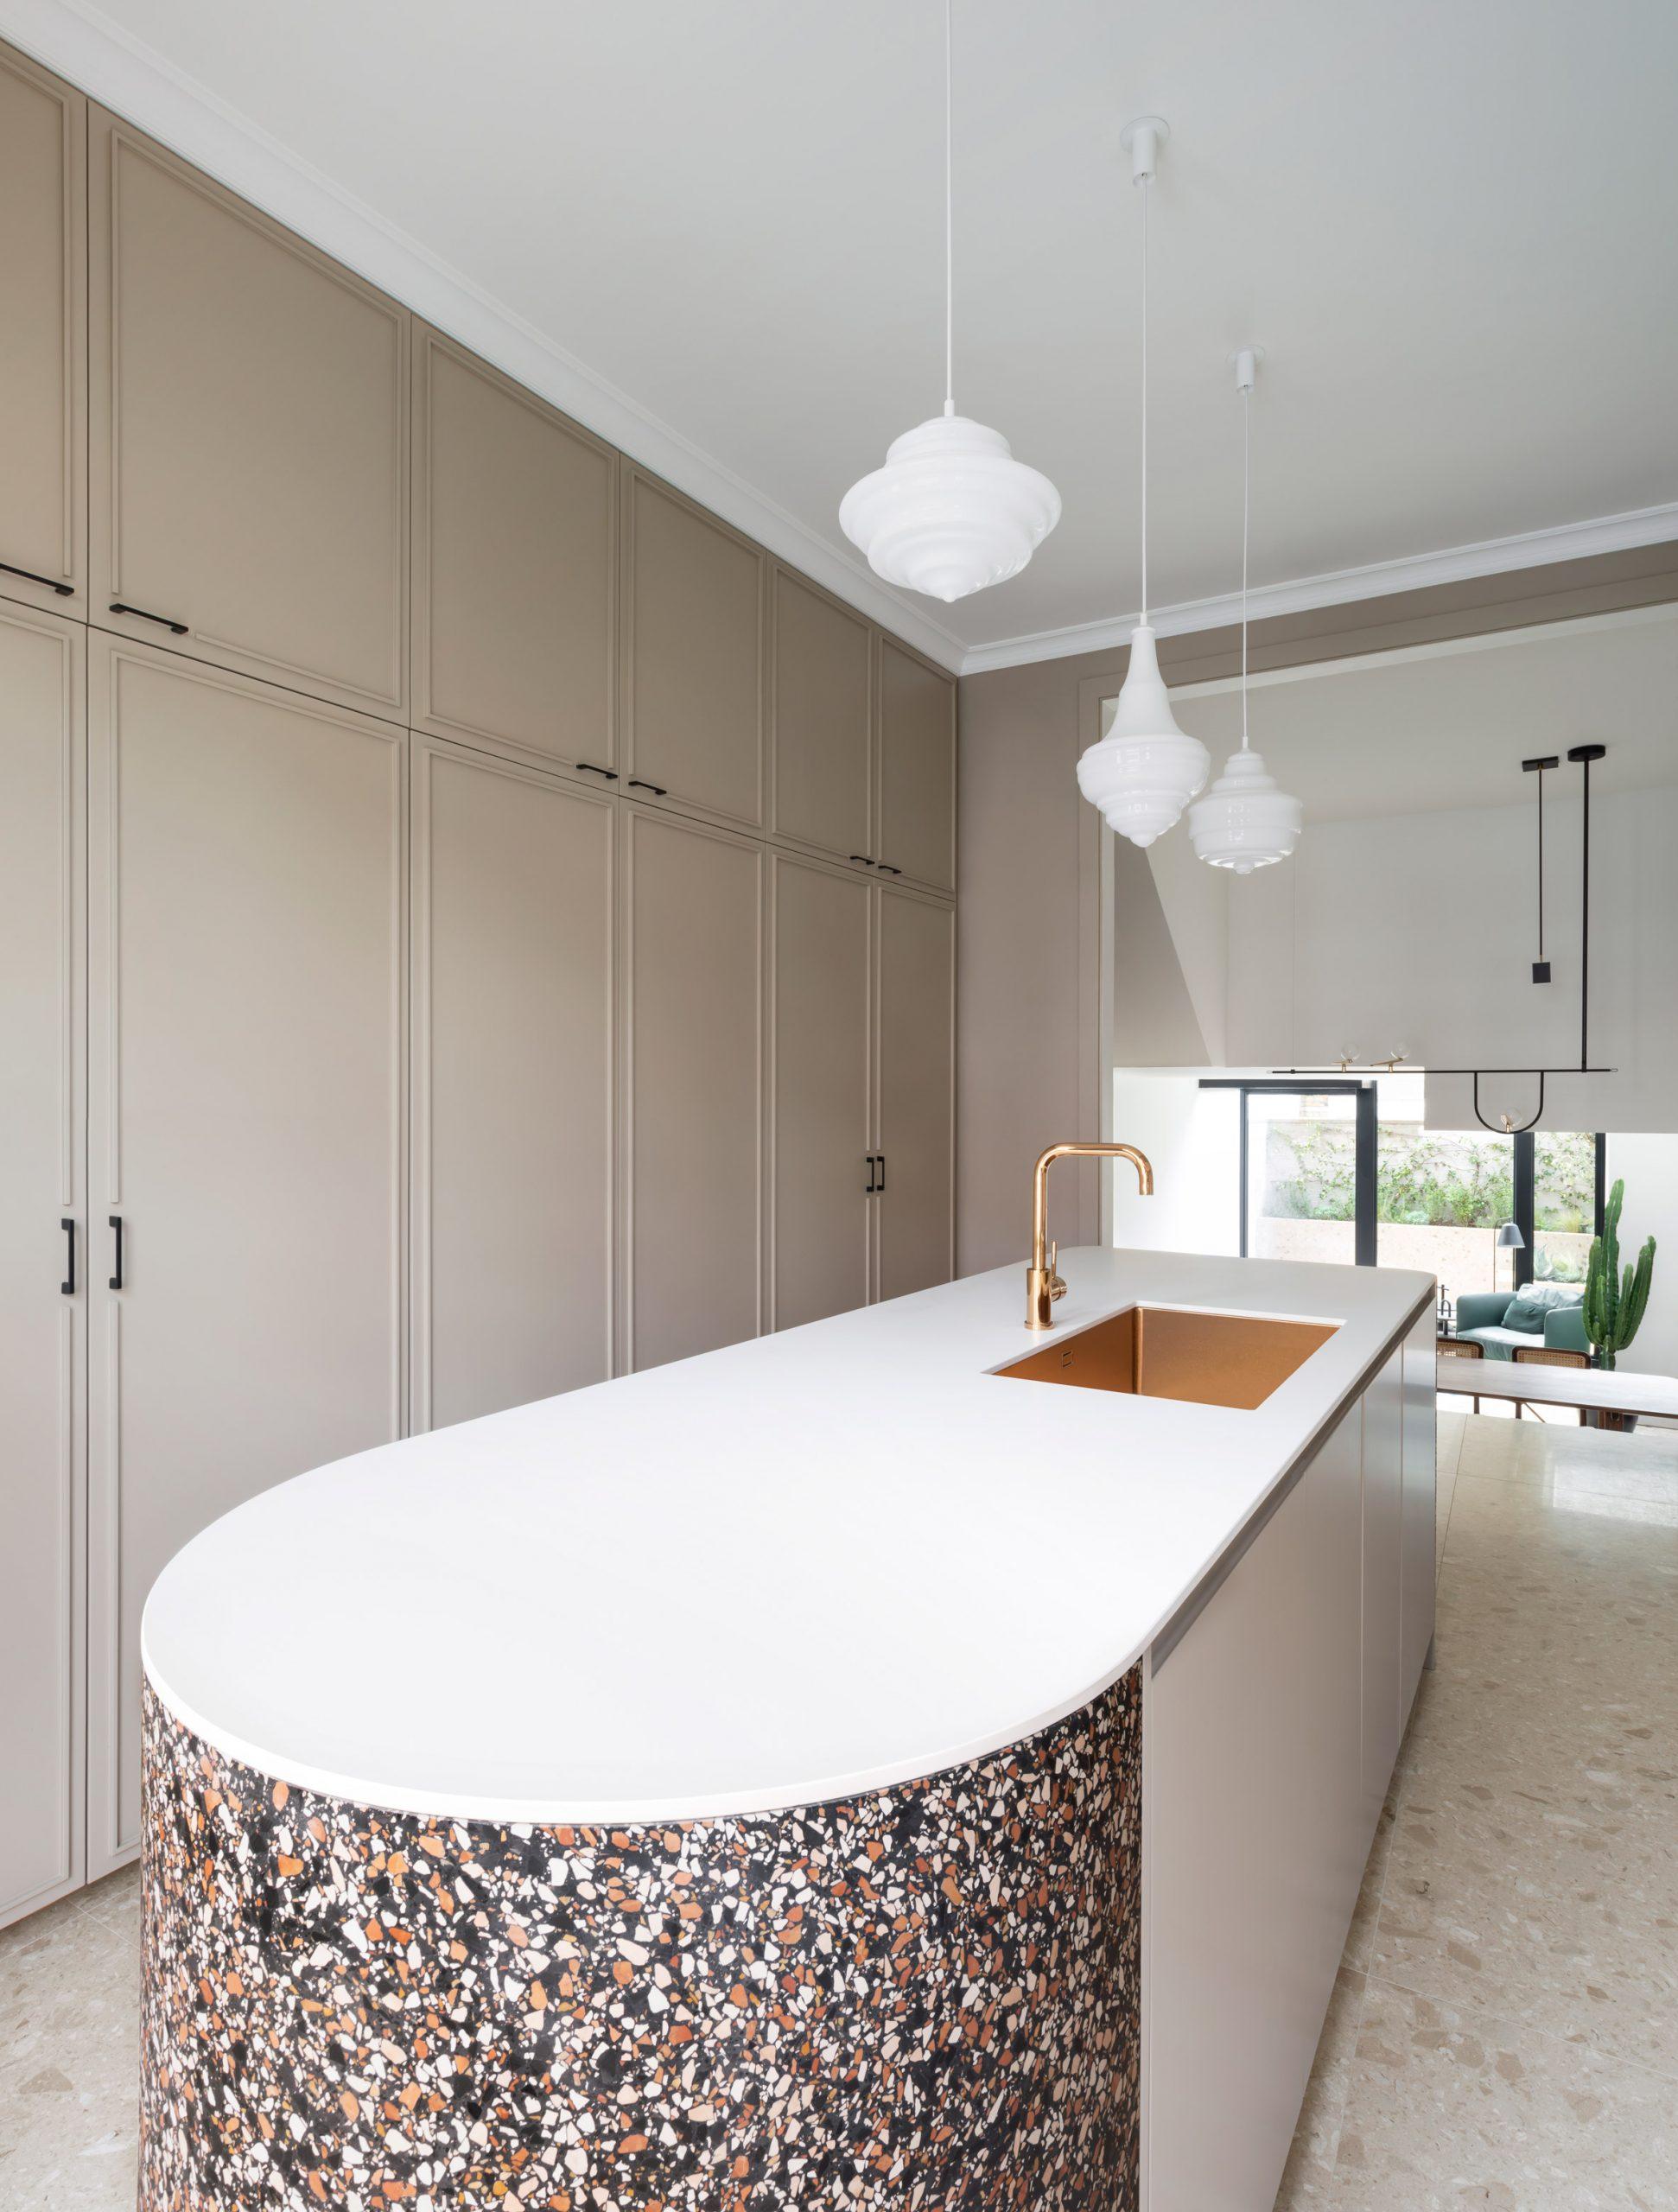 Kitchen at Frame House by Bureau de Change